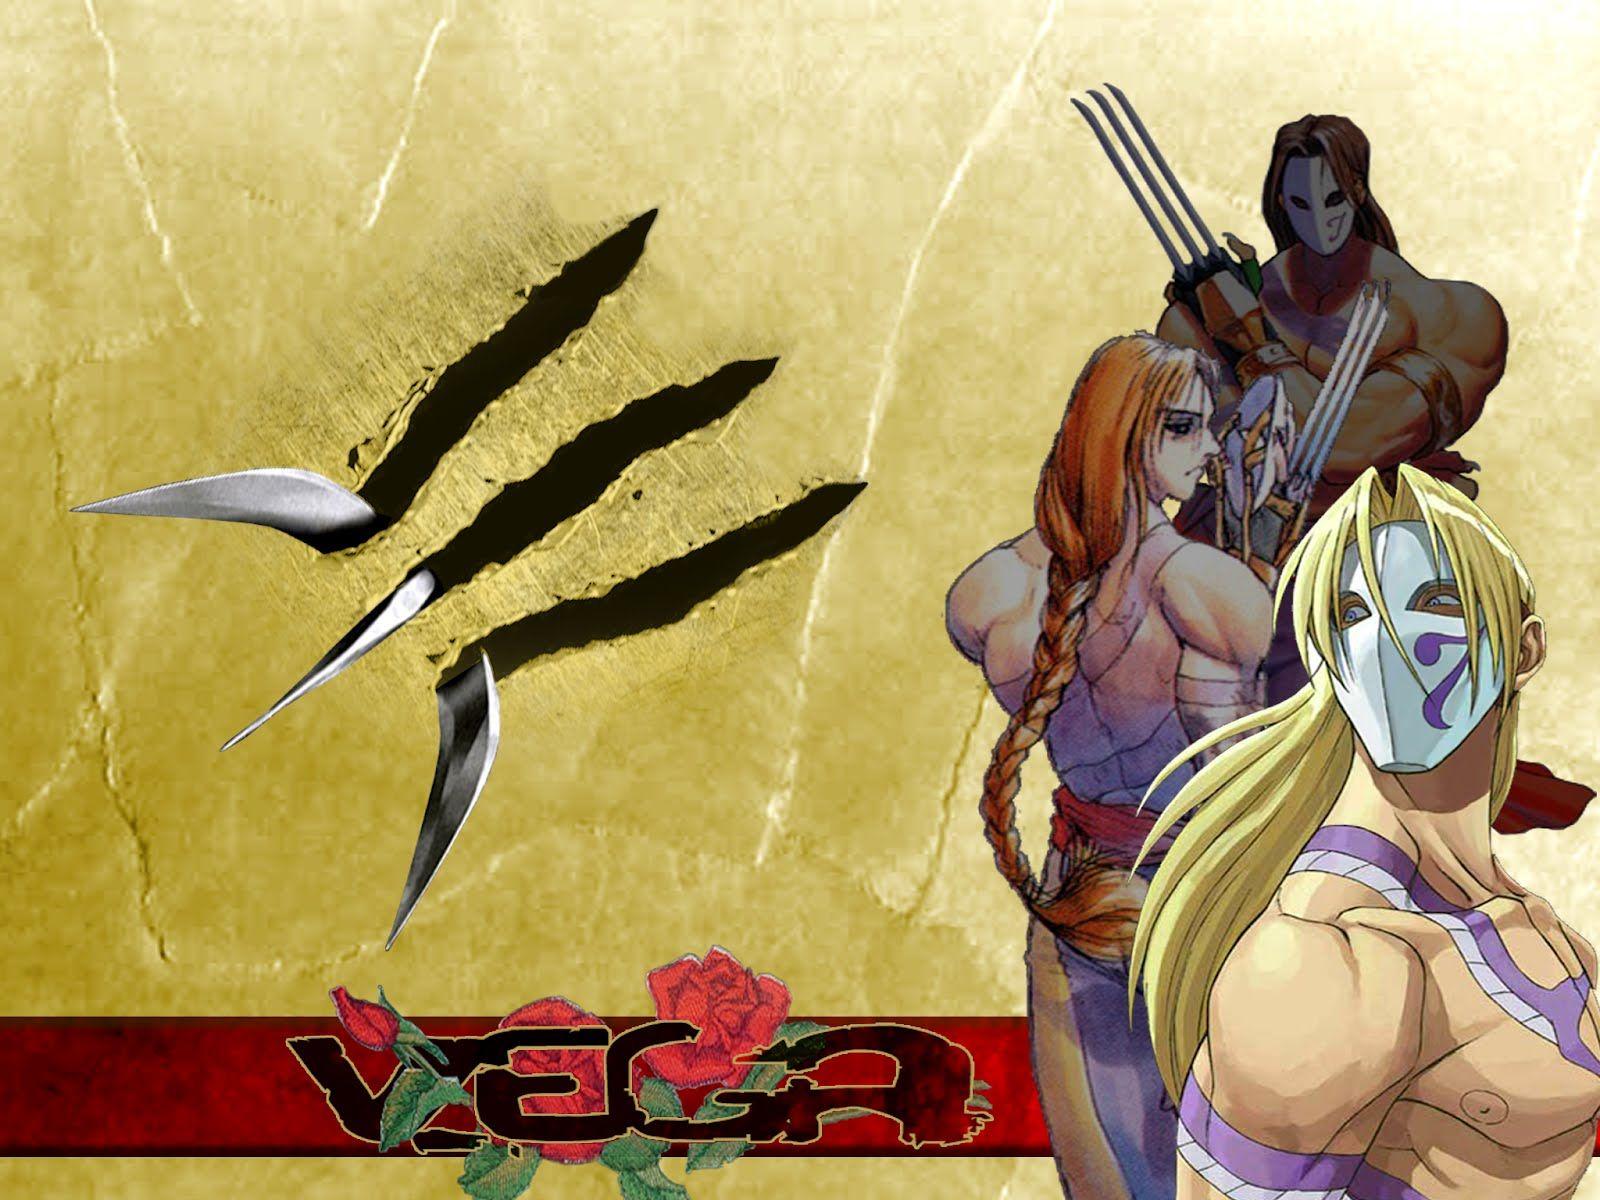 Vega Street Fighter V Hd Wallpaper 1920x1080 Id 58151 With